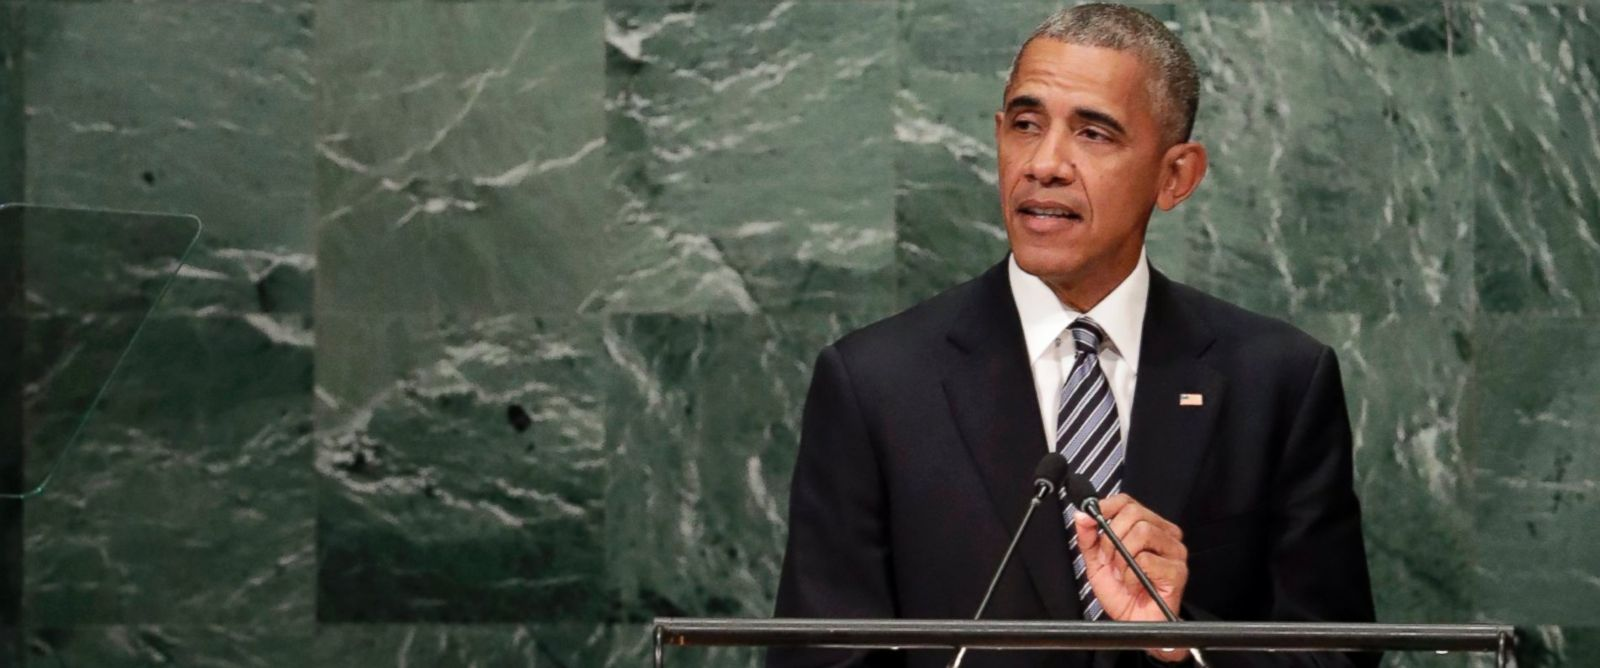 Image result for President Obama's Final Speech at 71st UNGA